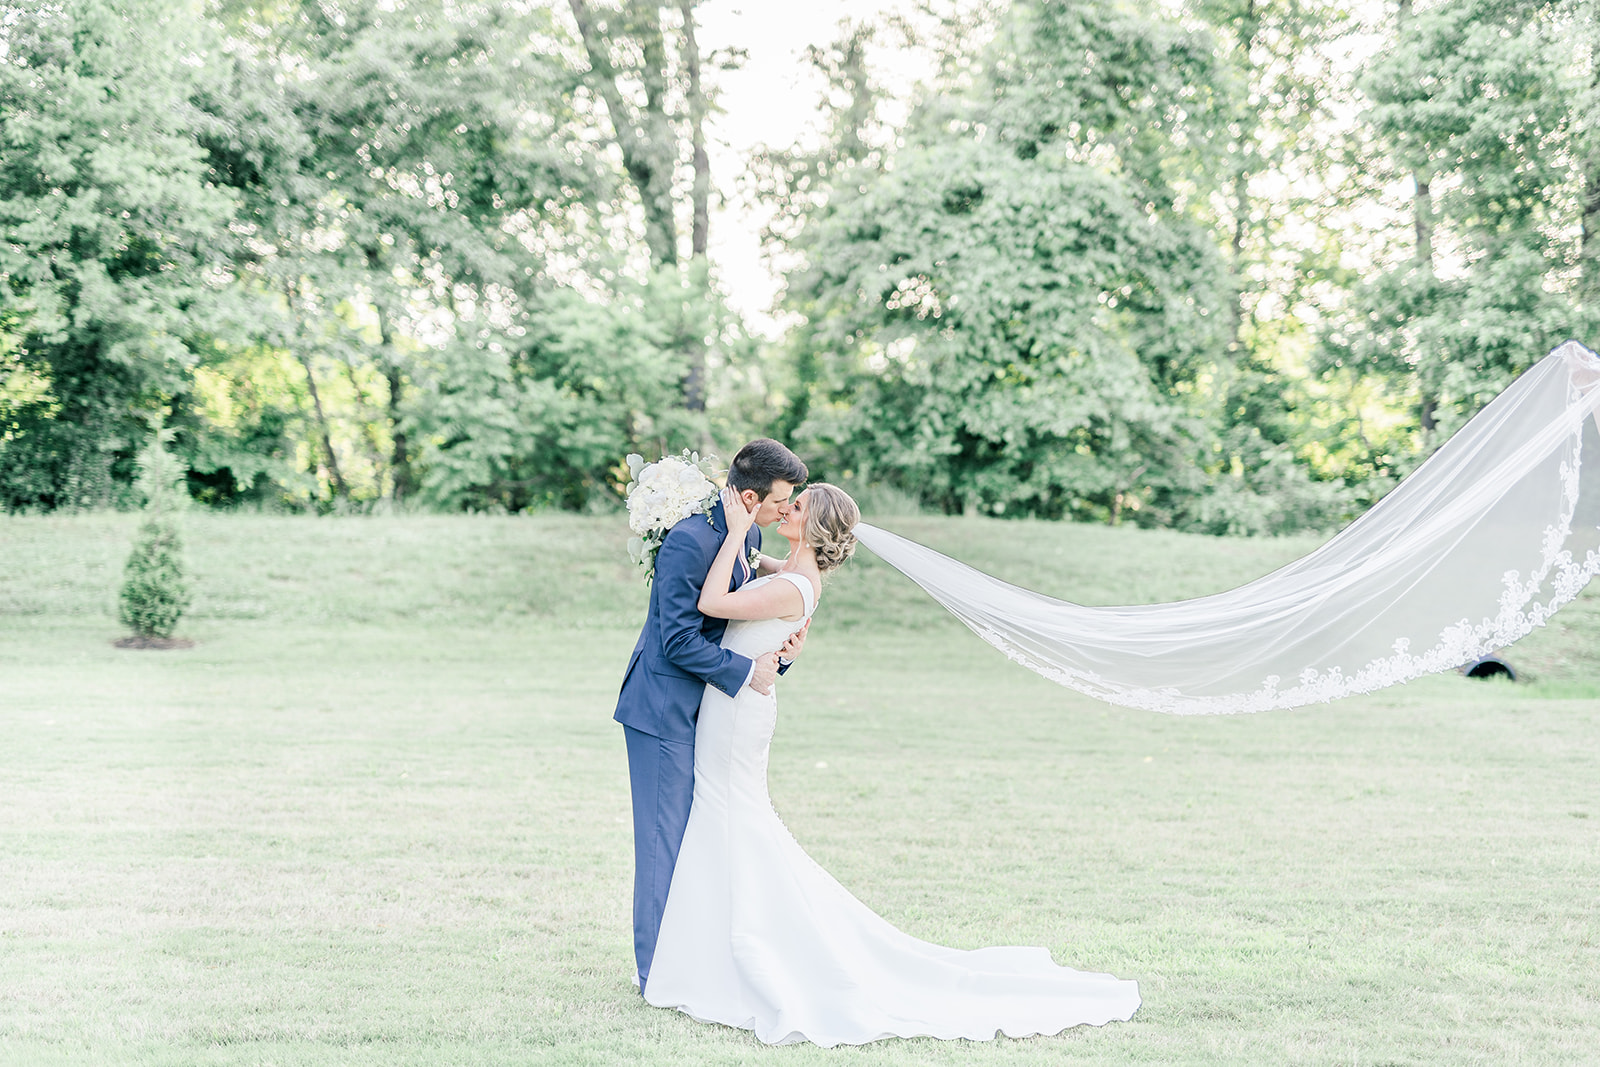 blush_wedding_at_white_oak_farms_medina_tn-00410.jpg